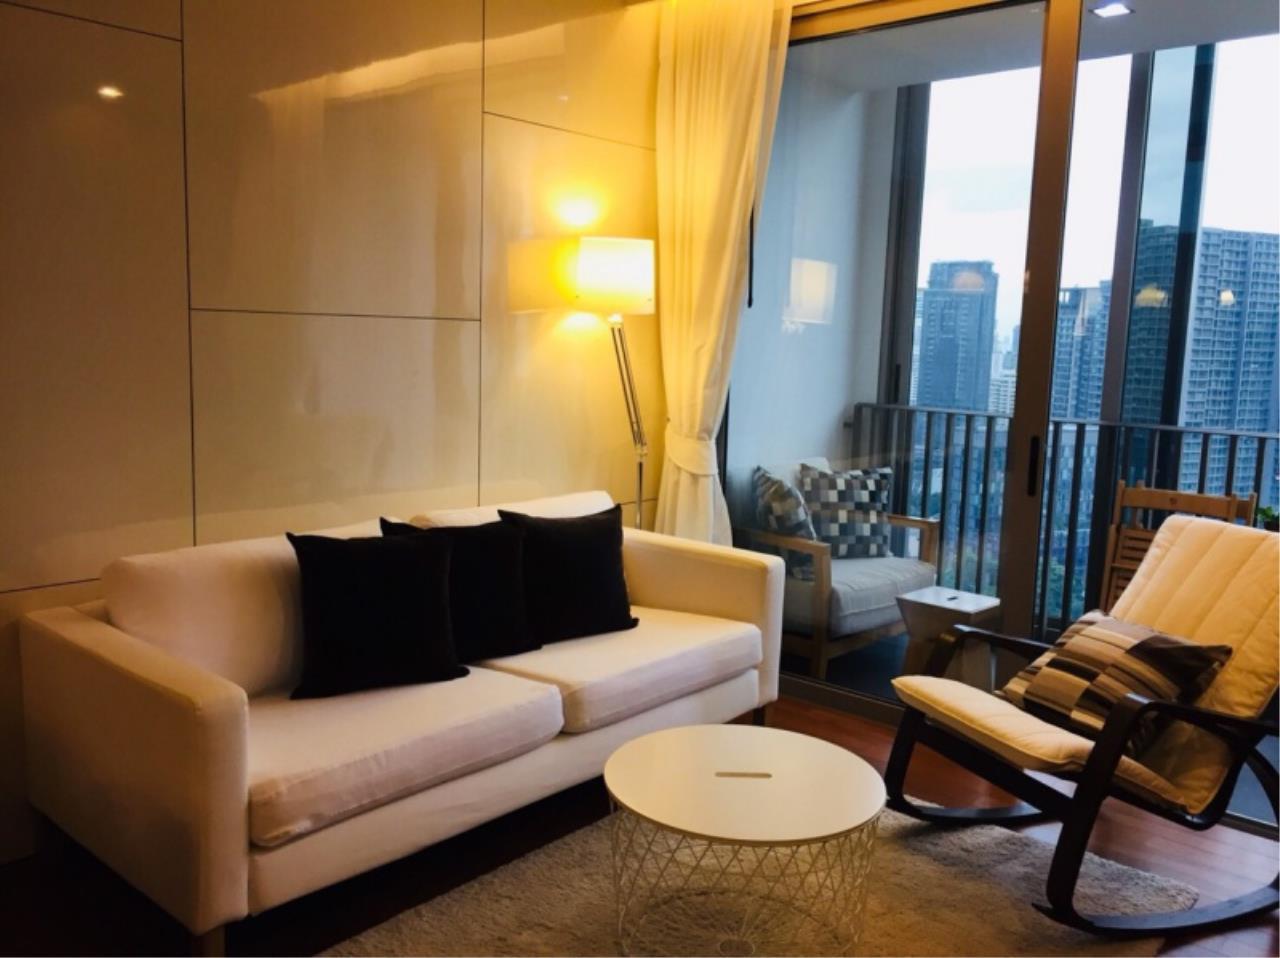 Century21 Skylux Agency's Ashton Morph 38 / Condo For Rent / 2 Bedroom / 75 SQM / BTS Thong Lo / Bangkok 1